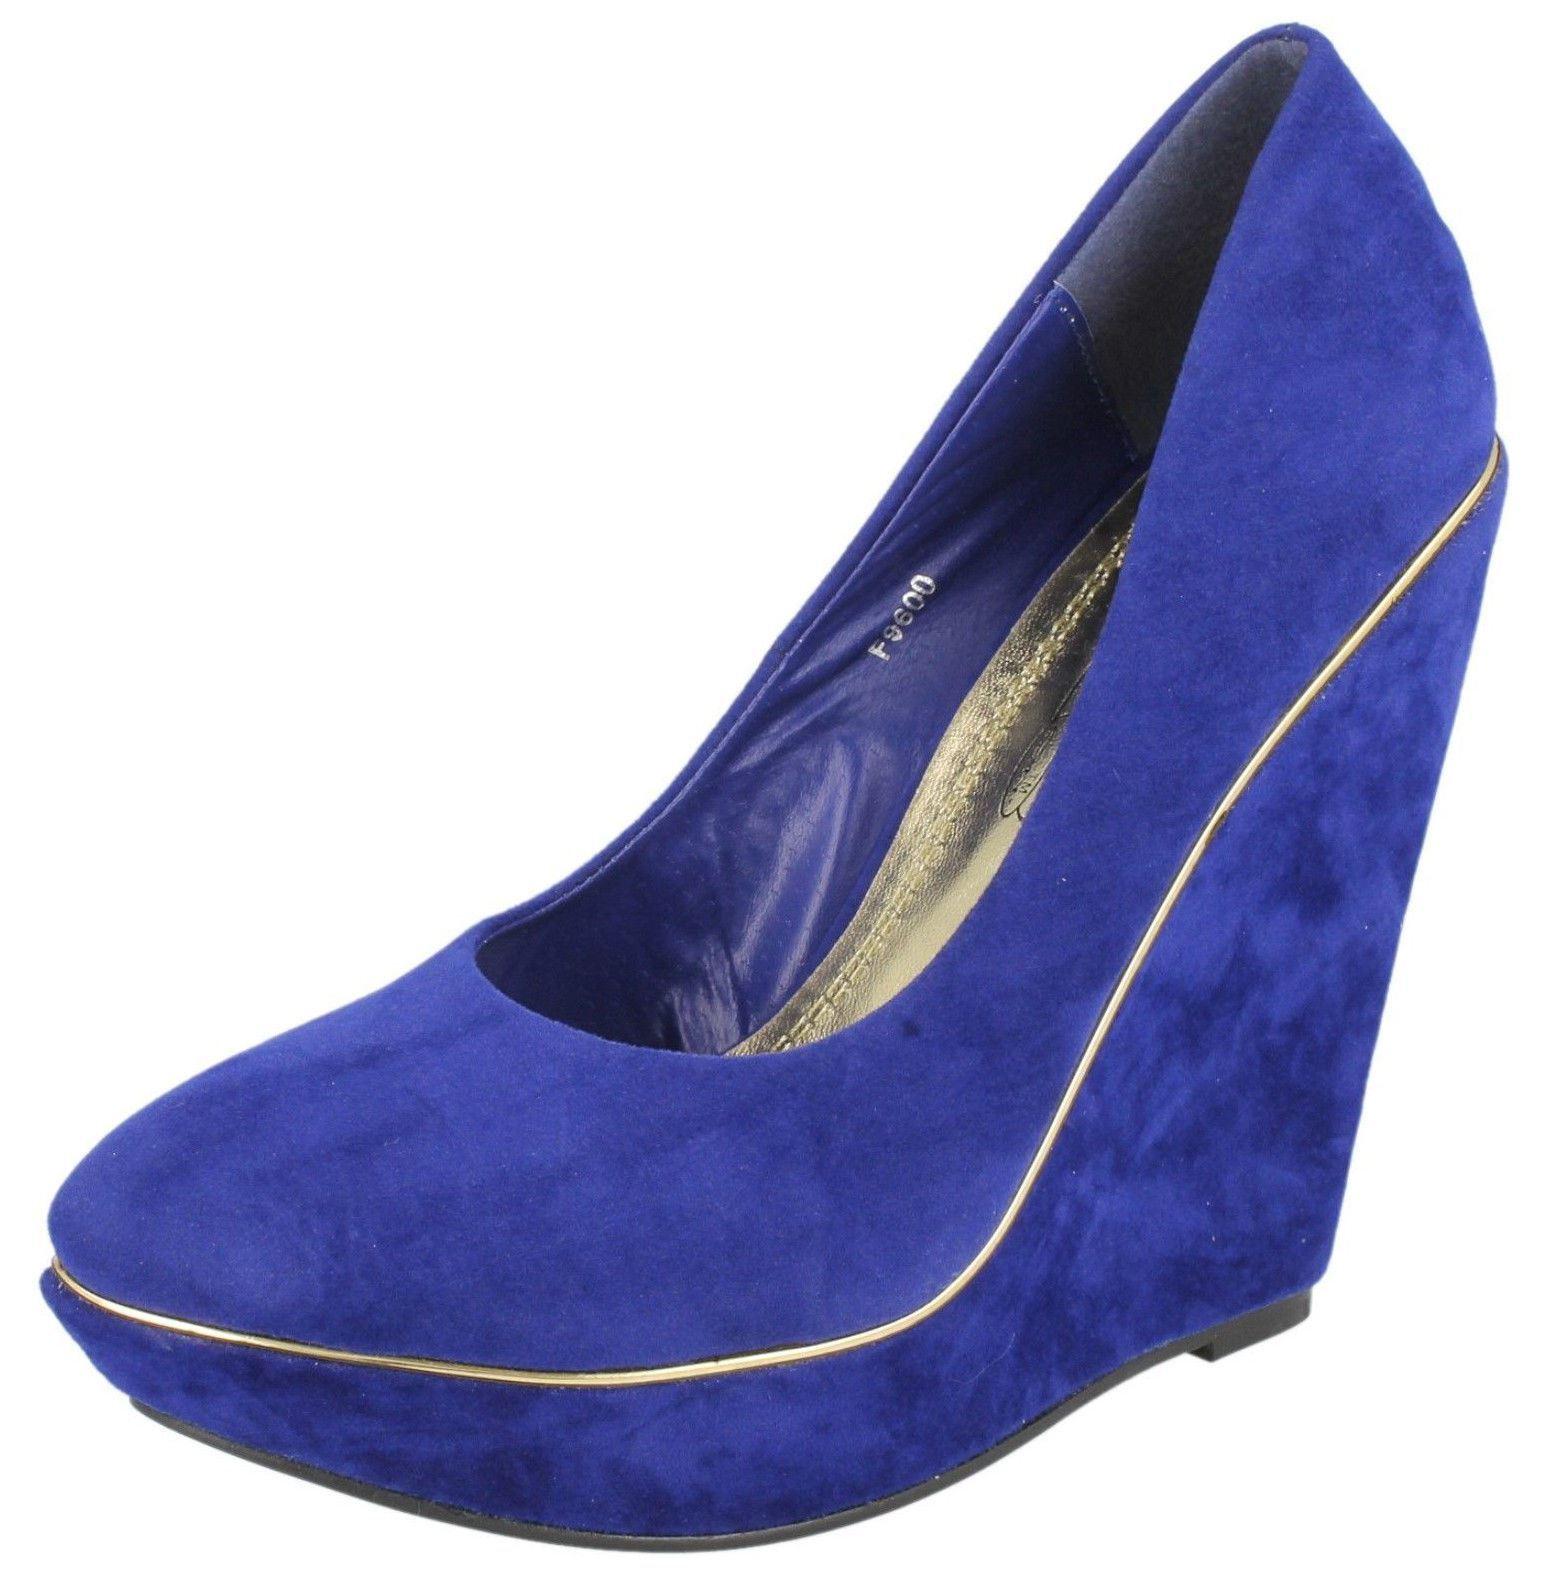 Moda jest prosta i niedroga Mujeres Puntera Azul Zueco Mocasín Zapatos De Salón Plataforma Tacón F9600